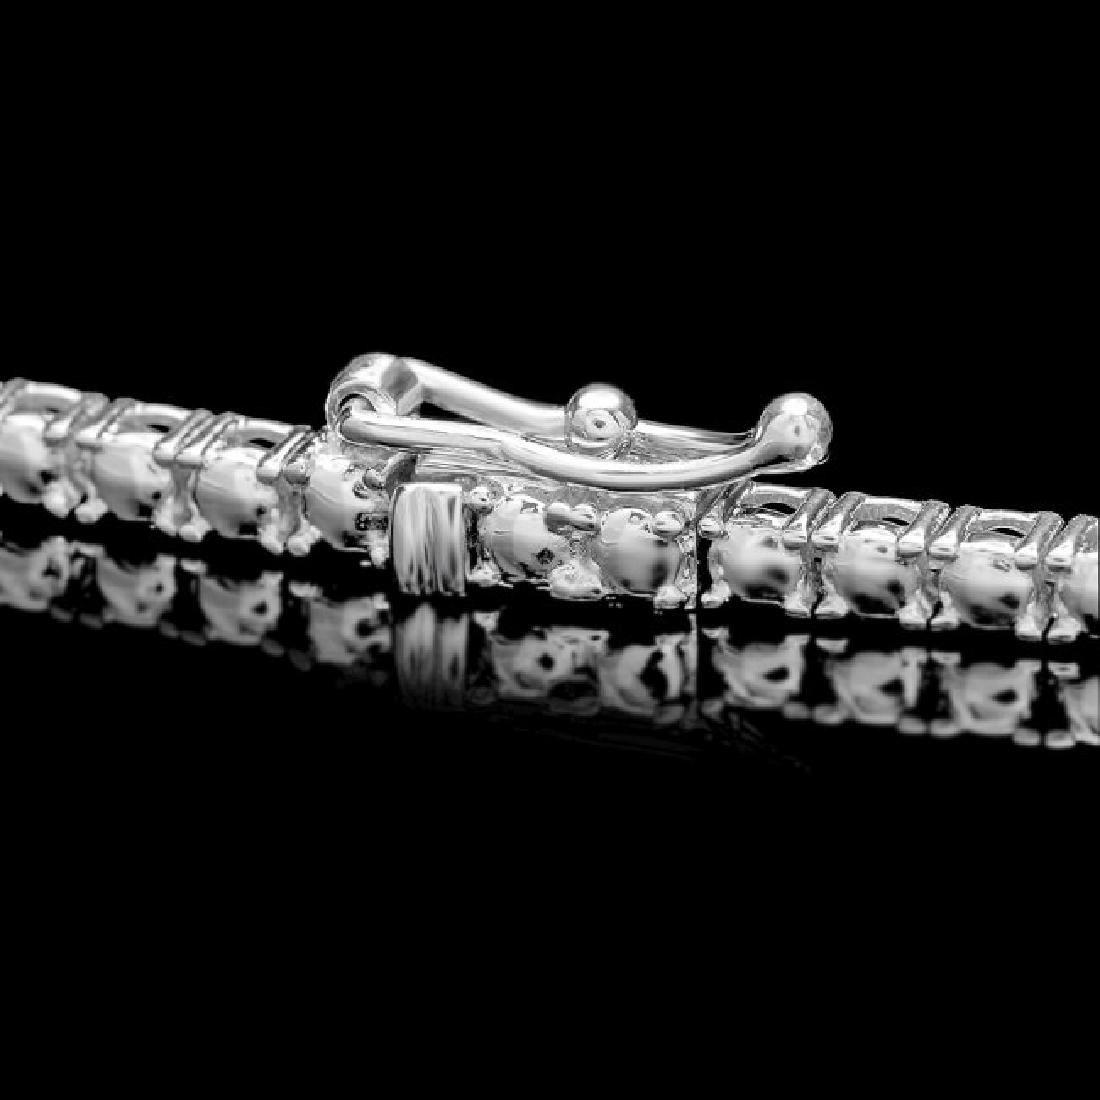 18k White Gold 12.90ct Diamond Necklace - 3